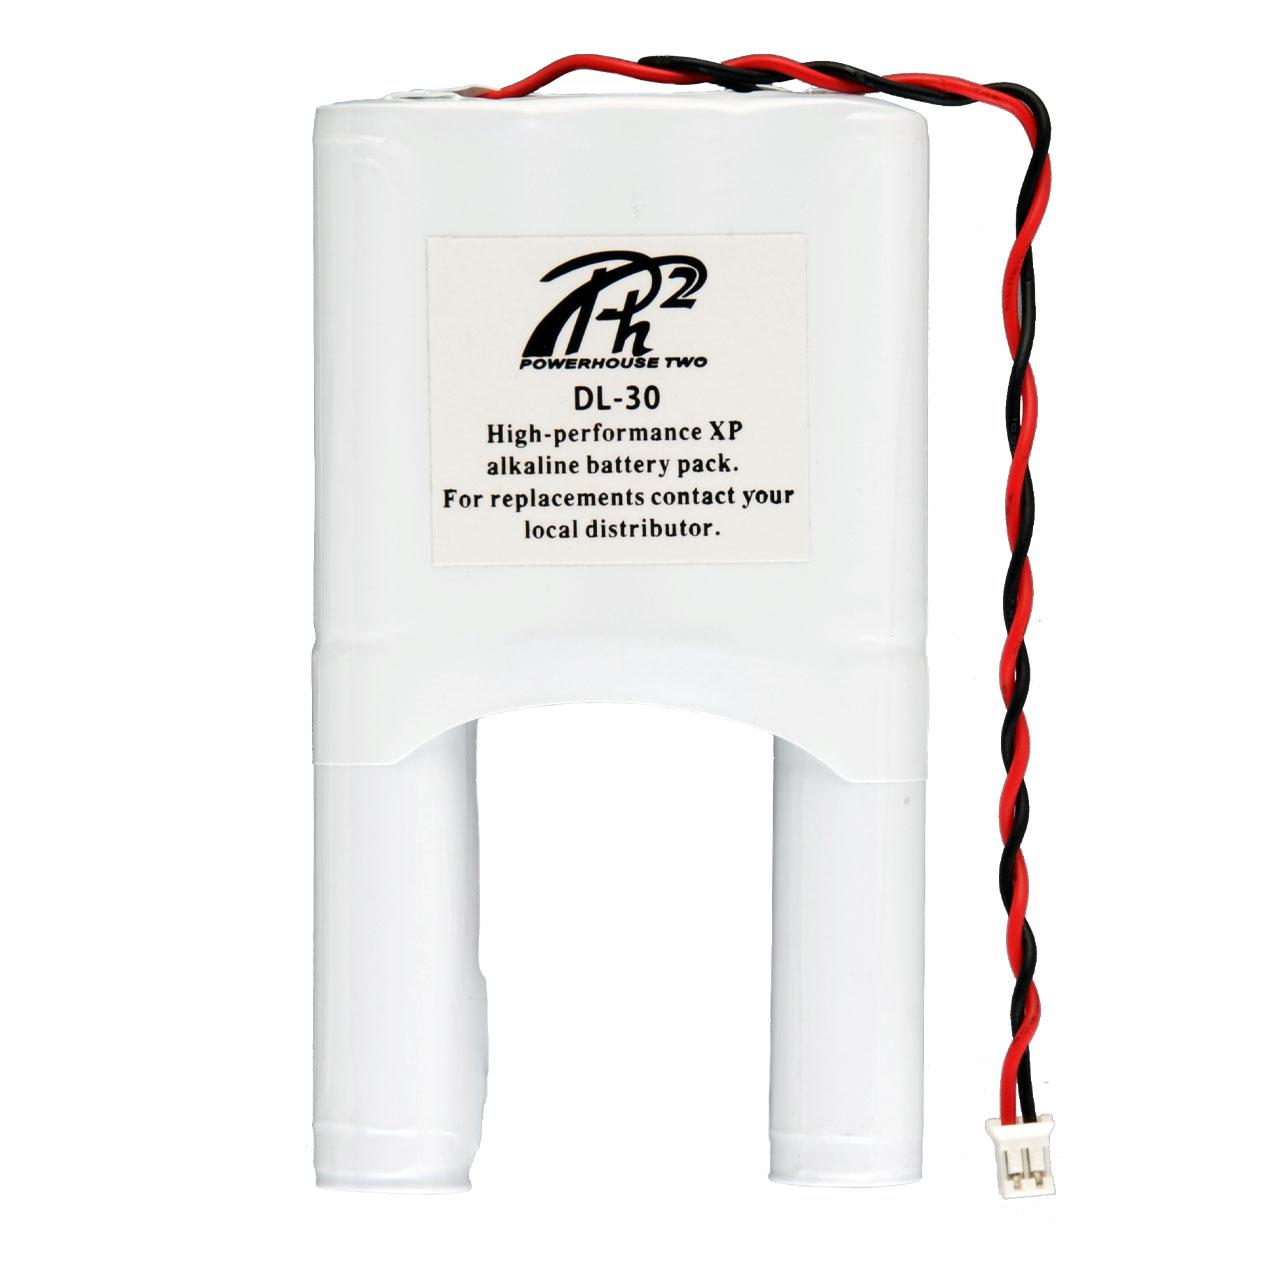 DL-30 Hospitality Battery Pack